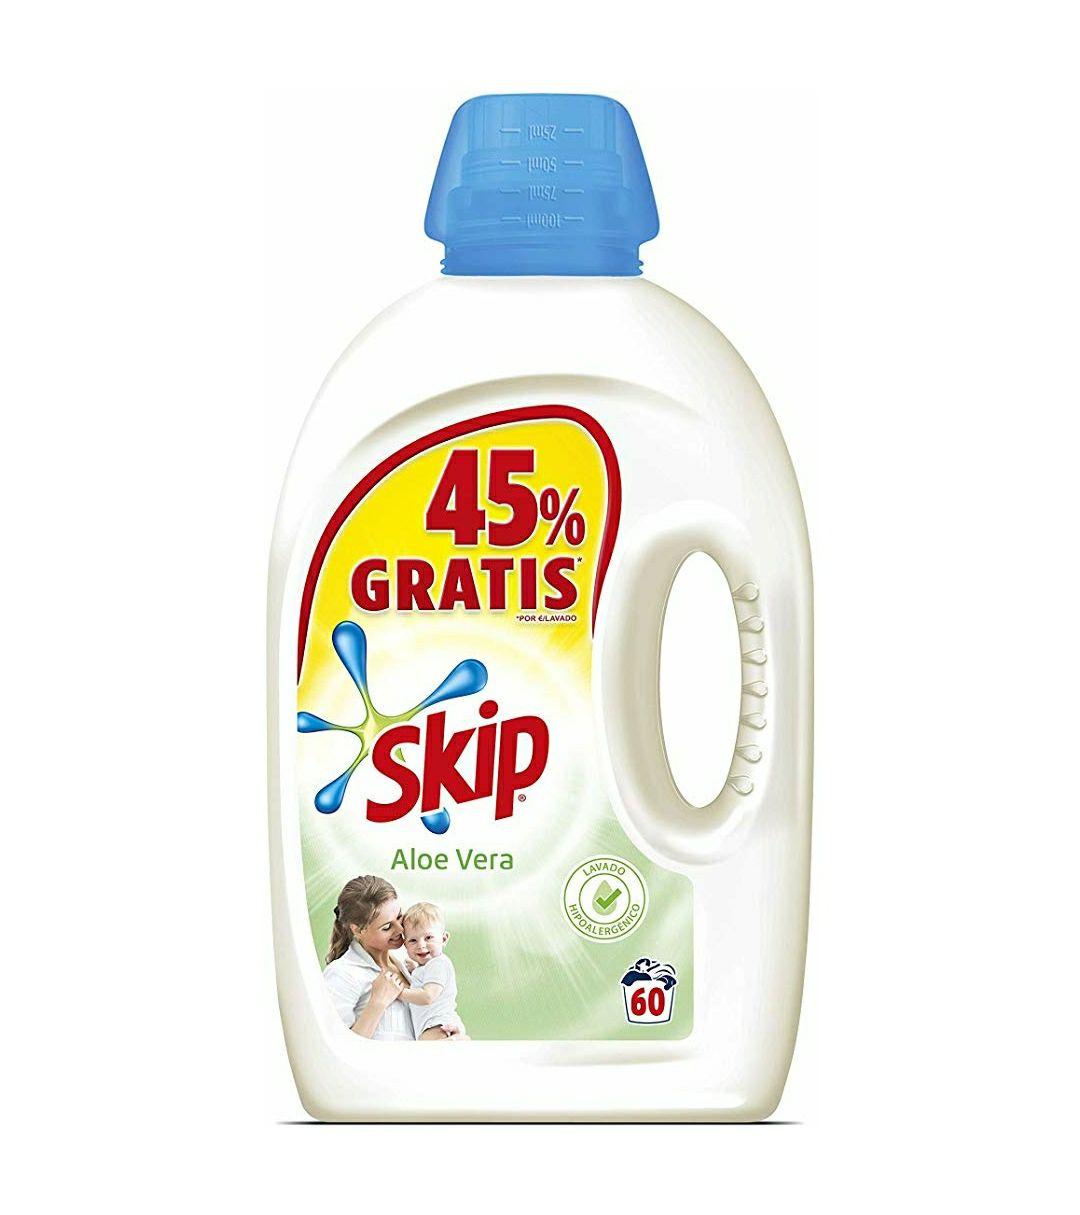 60 Lavados Detergente Líquido Skip Aloe Vera [MINIMO HISTÓRICO]